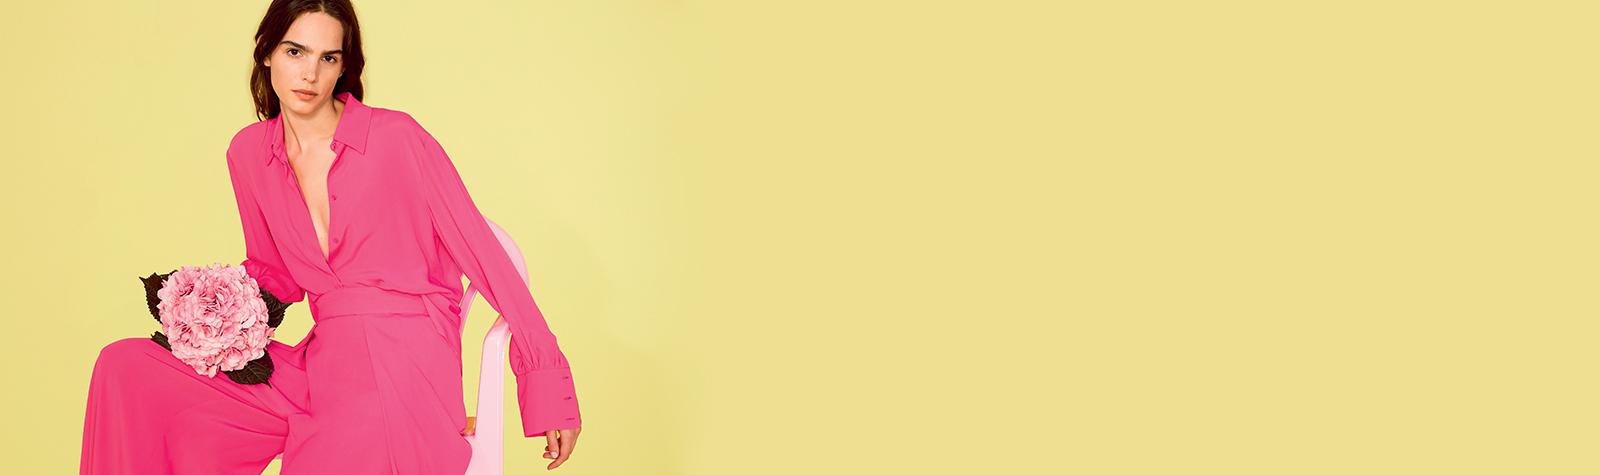 a1053f9594b1 Camicie da Donna Primavera Estate 2019